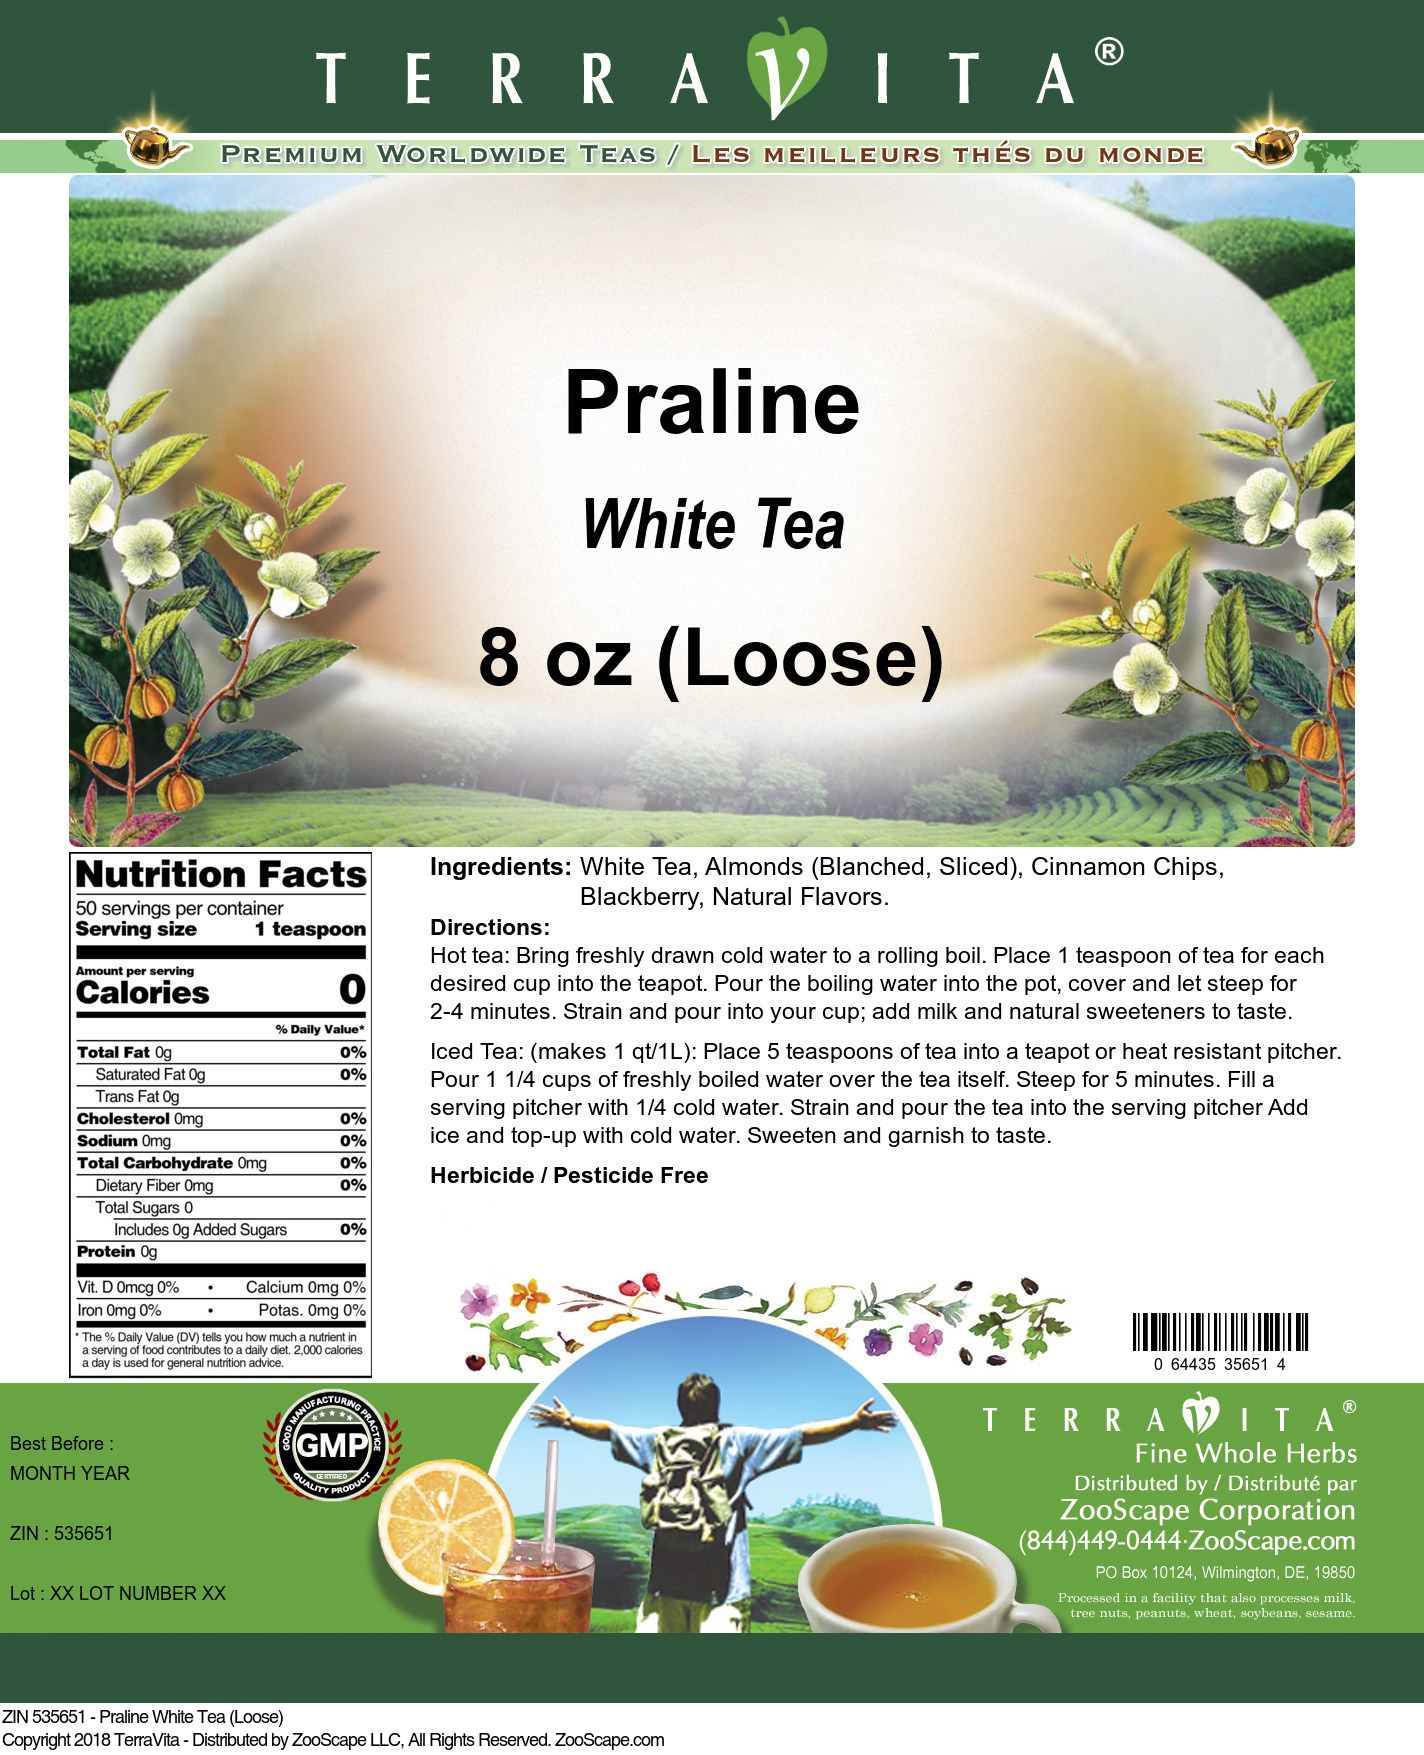 Praline White Tea (Loose)